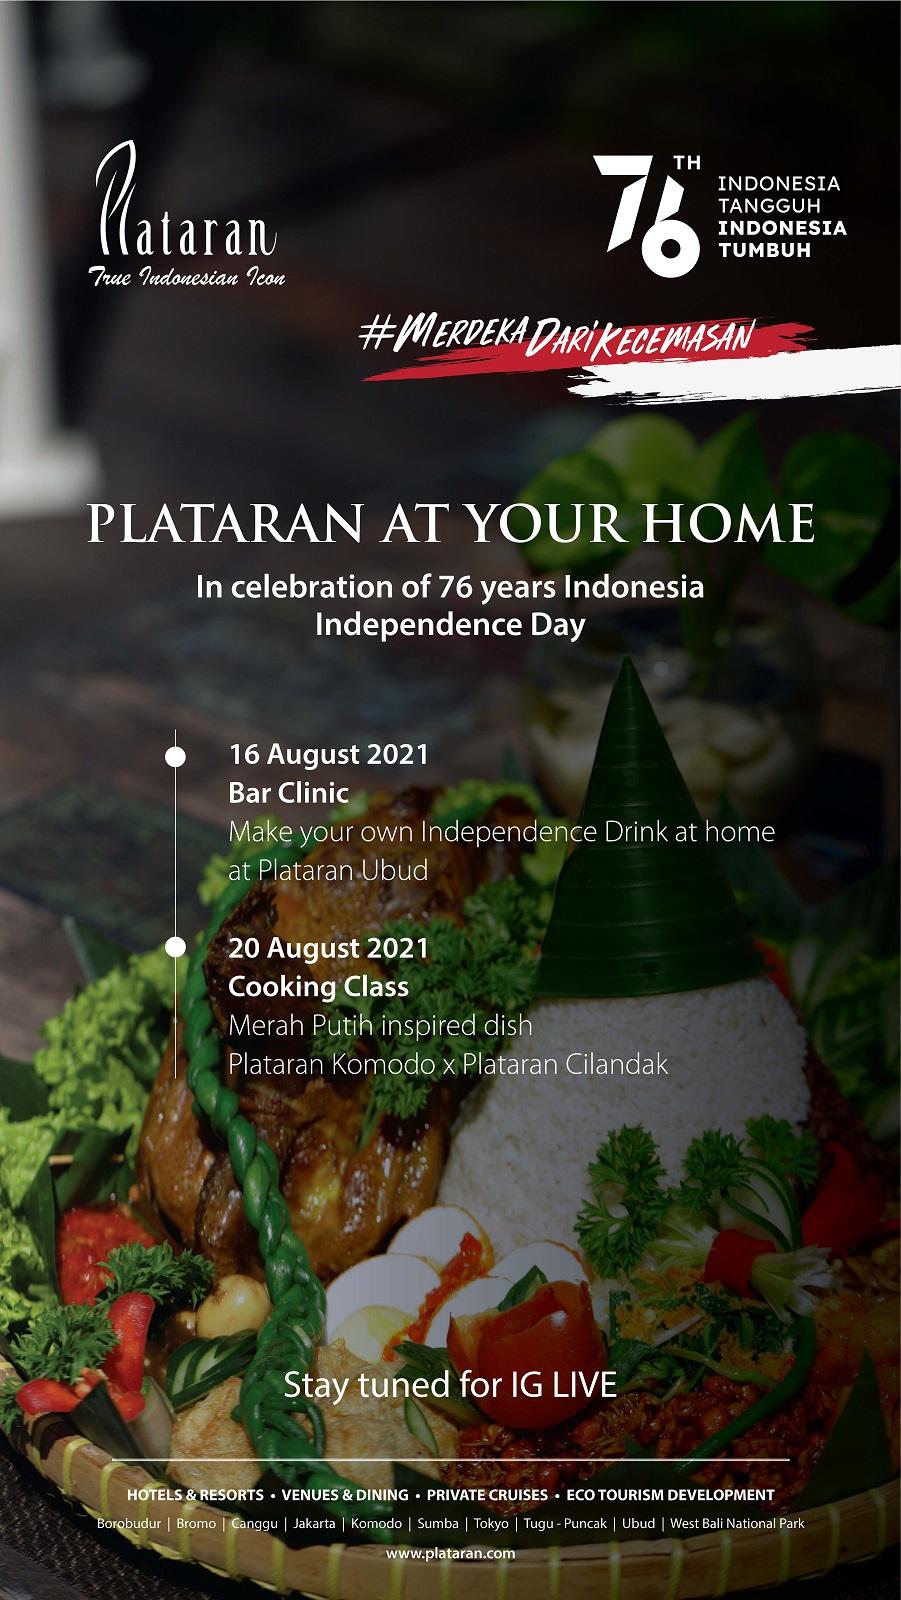 Plataran At Your Home